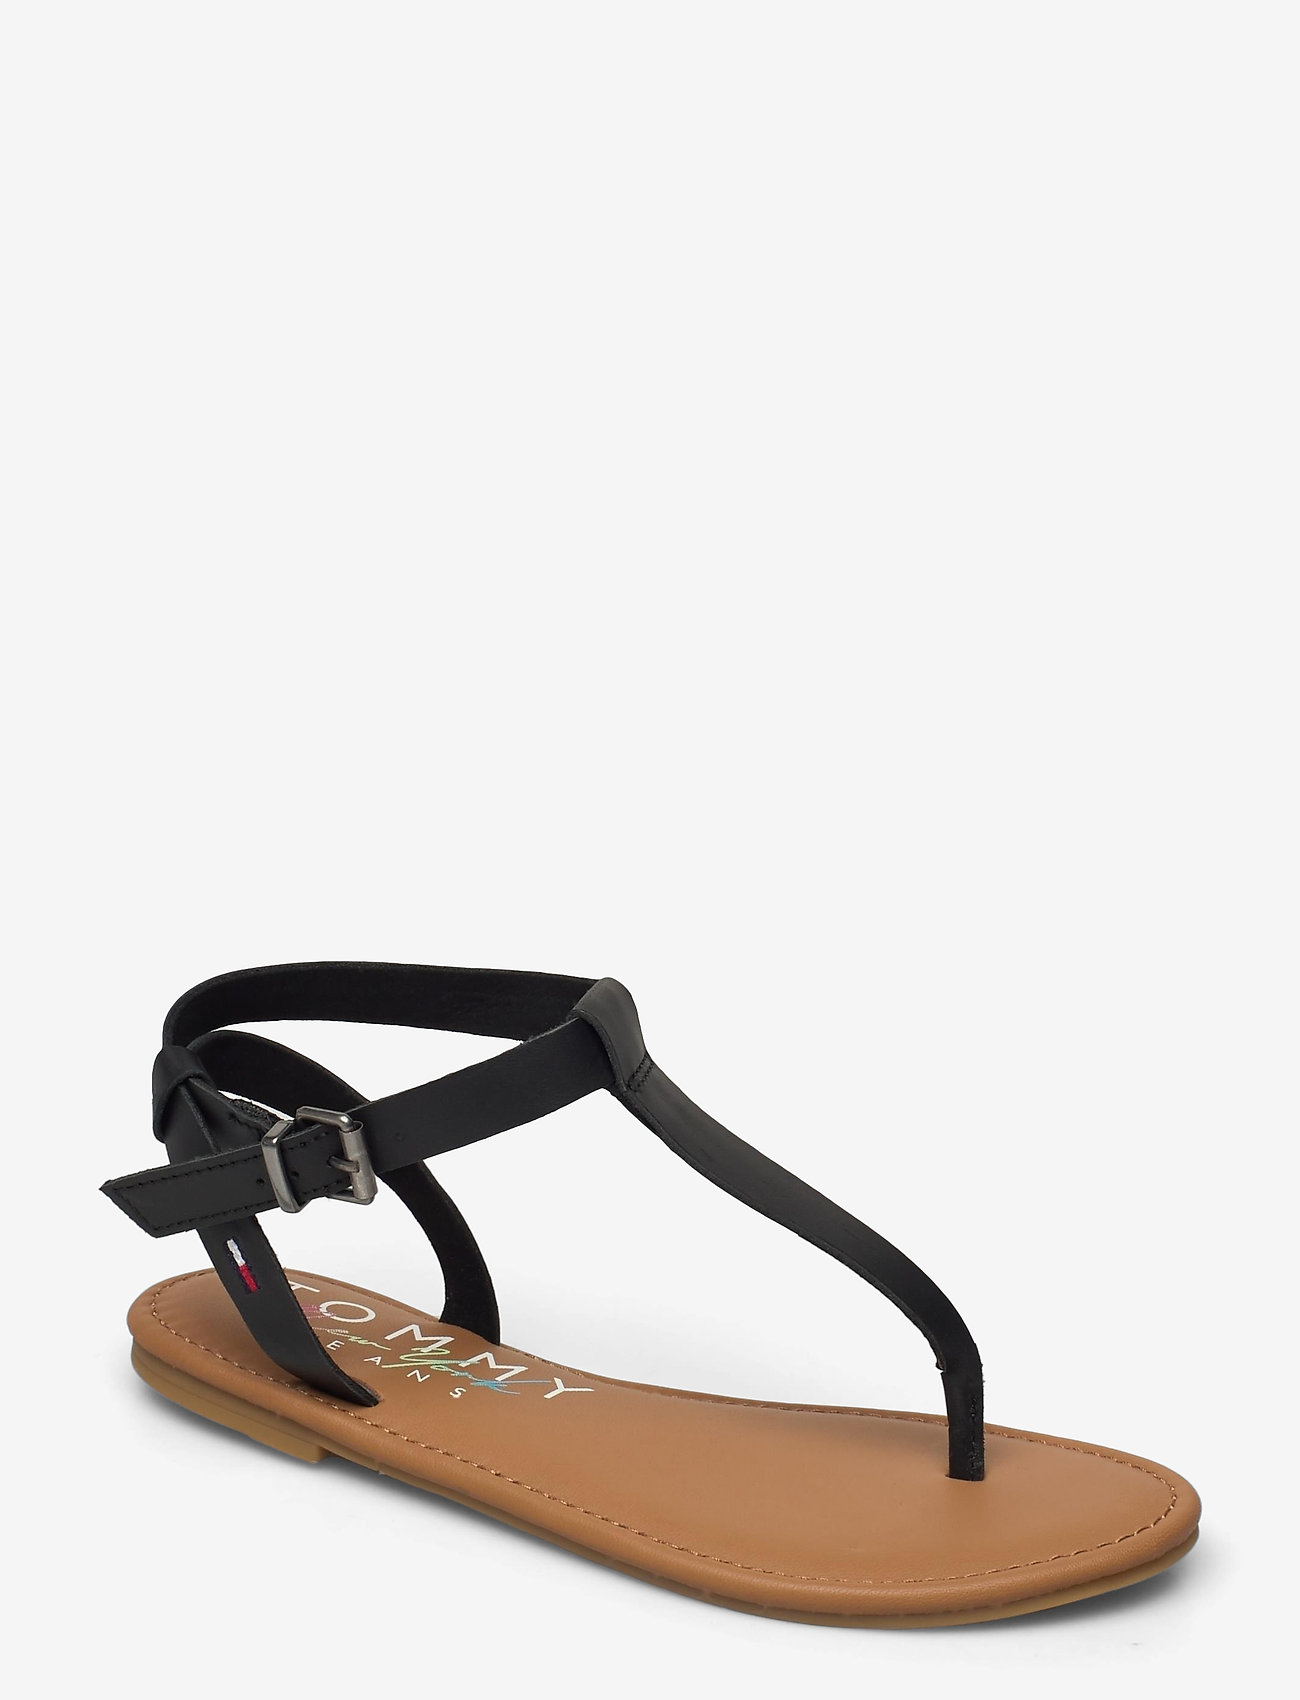 Tommy Hilfiger - ESSENTIAL TOE POST FLAT SANDAL - flat sandals - black - 0